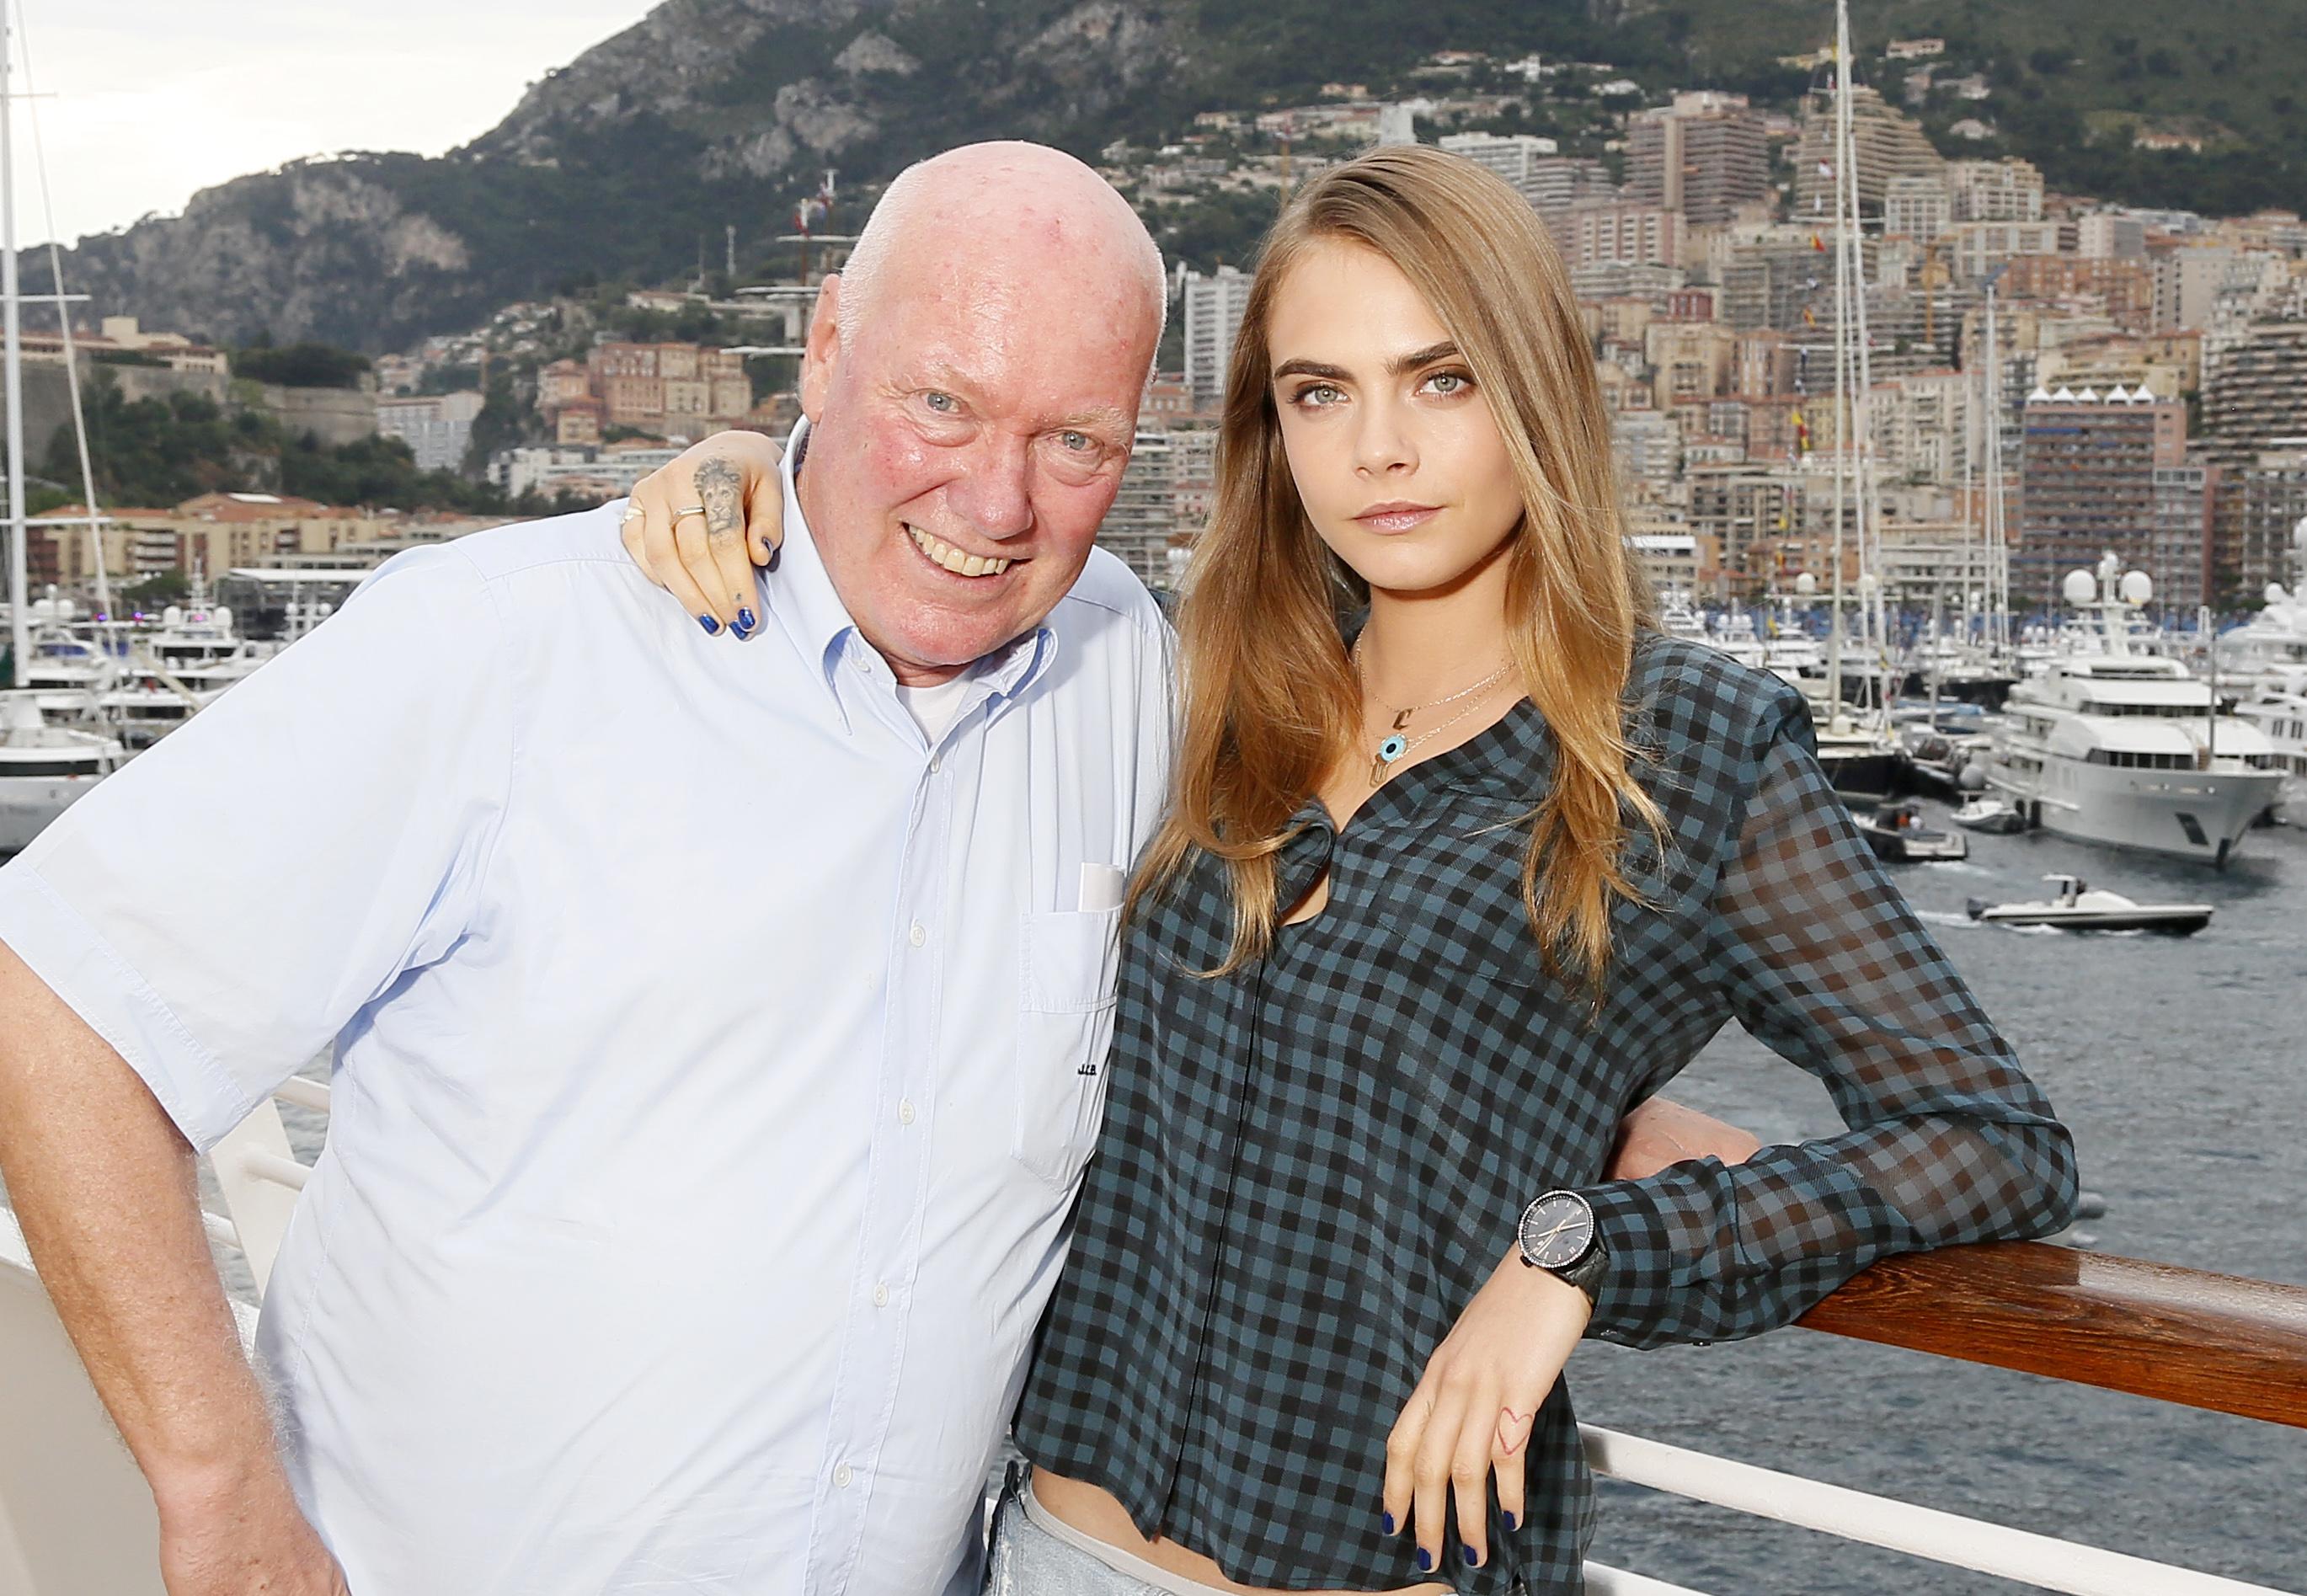 Model Cara Delevinge with Jean Claude Biver in Monaco